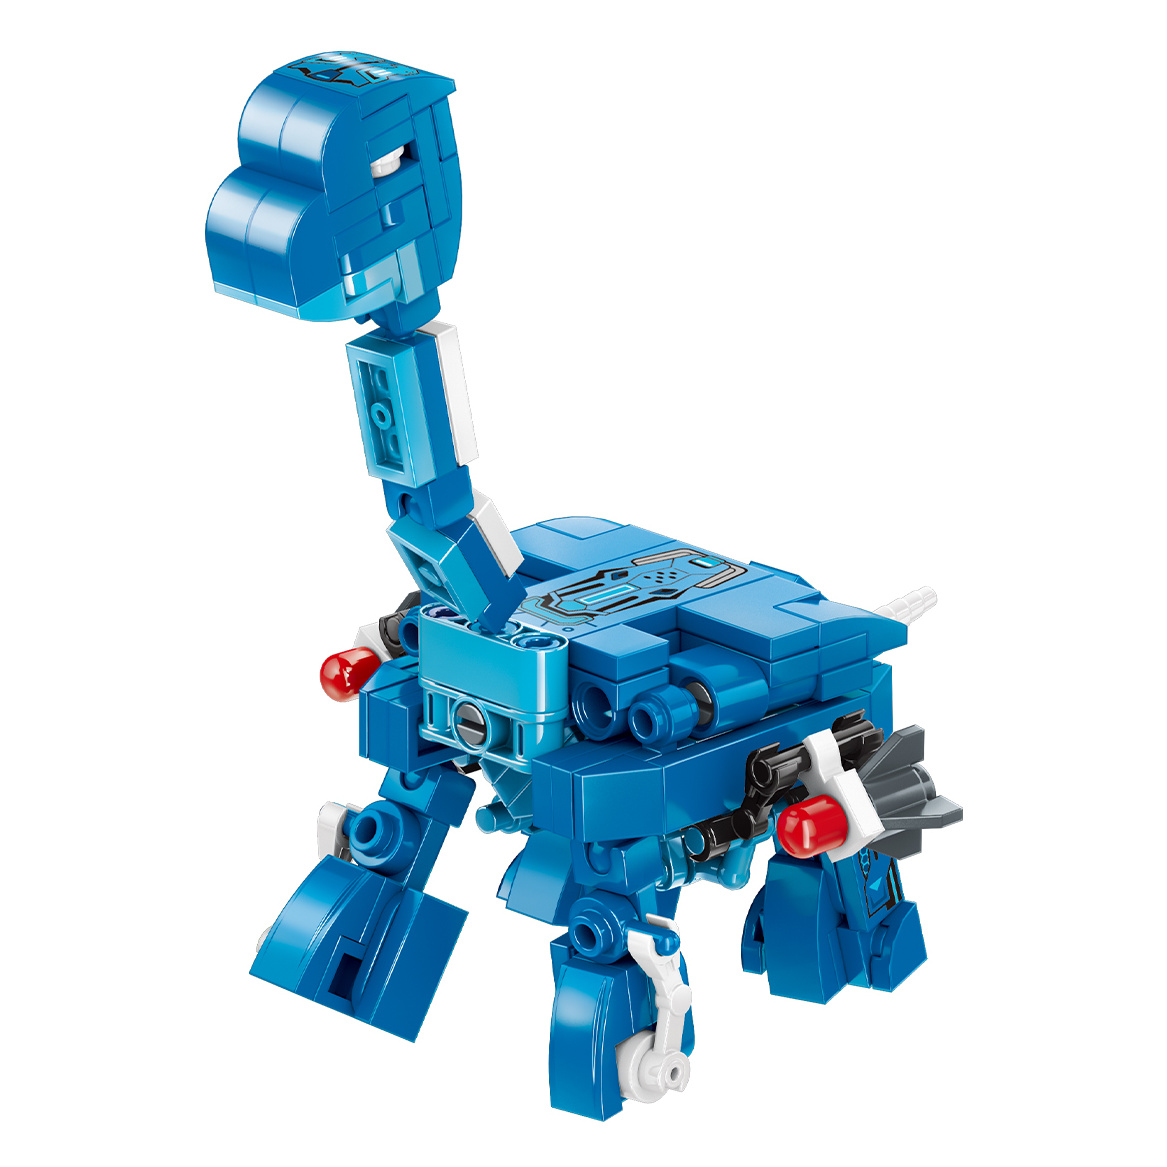 Qman Thunder Dragon 41204